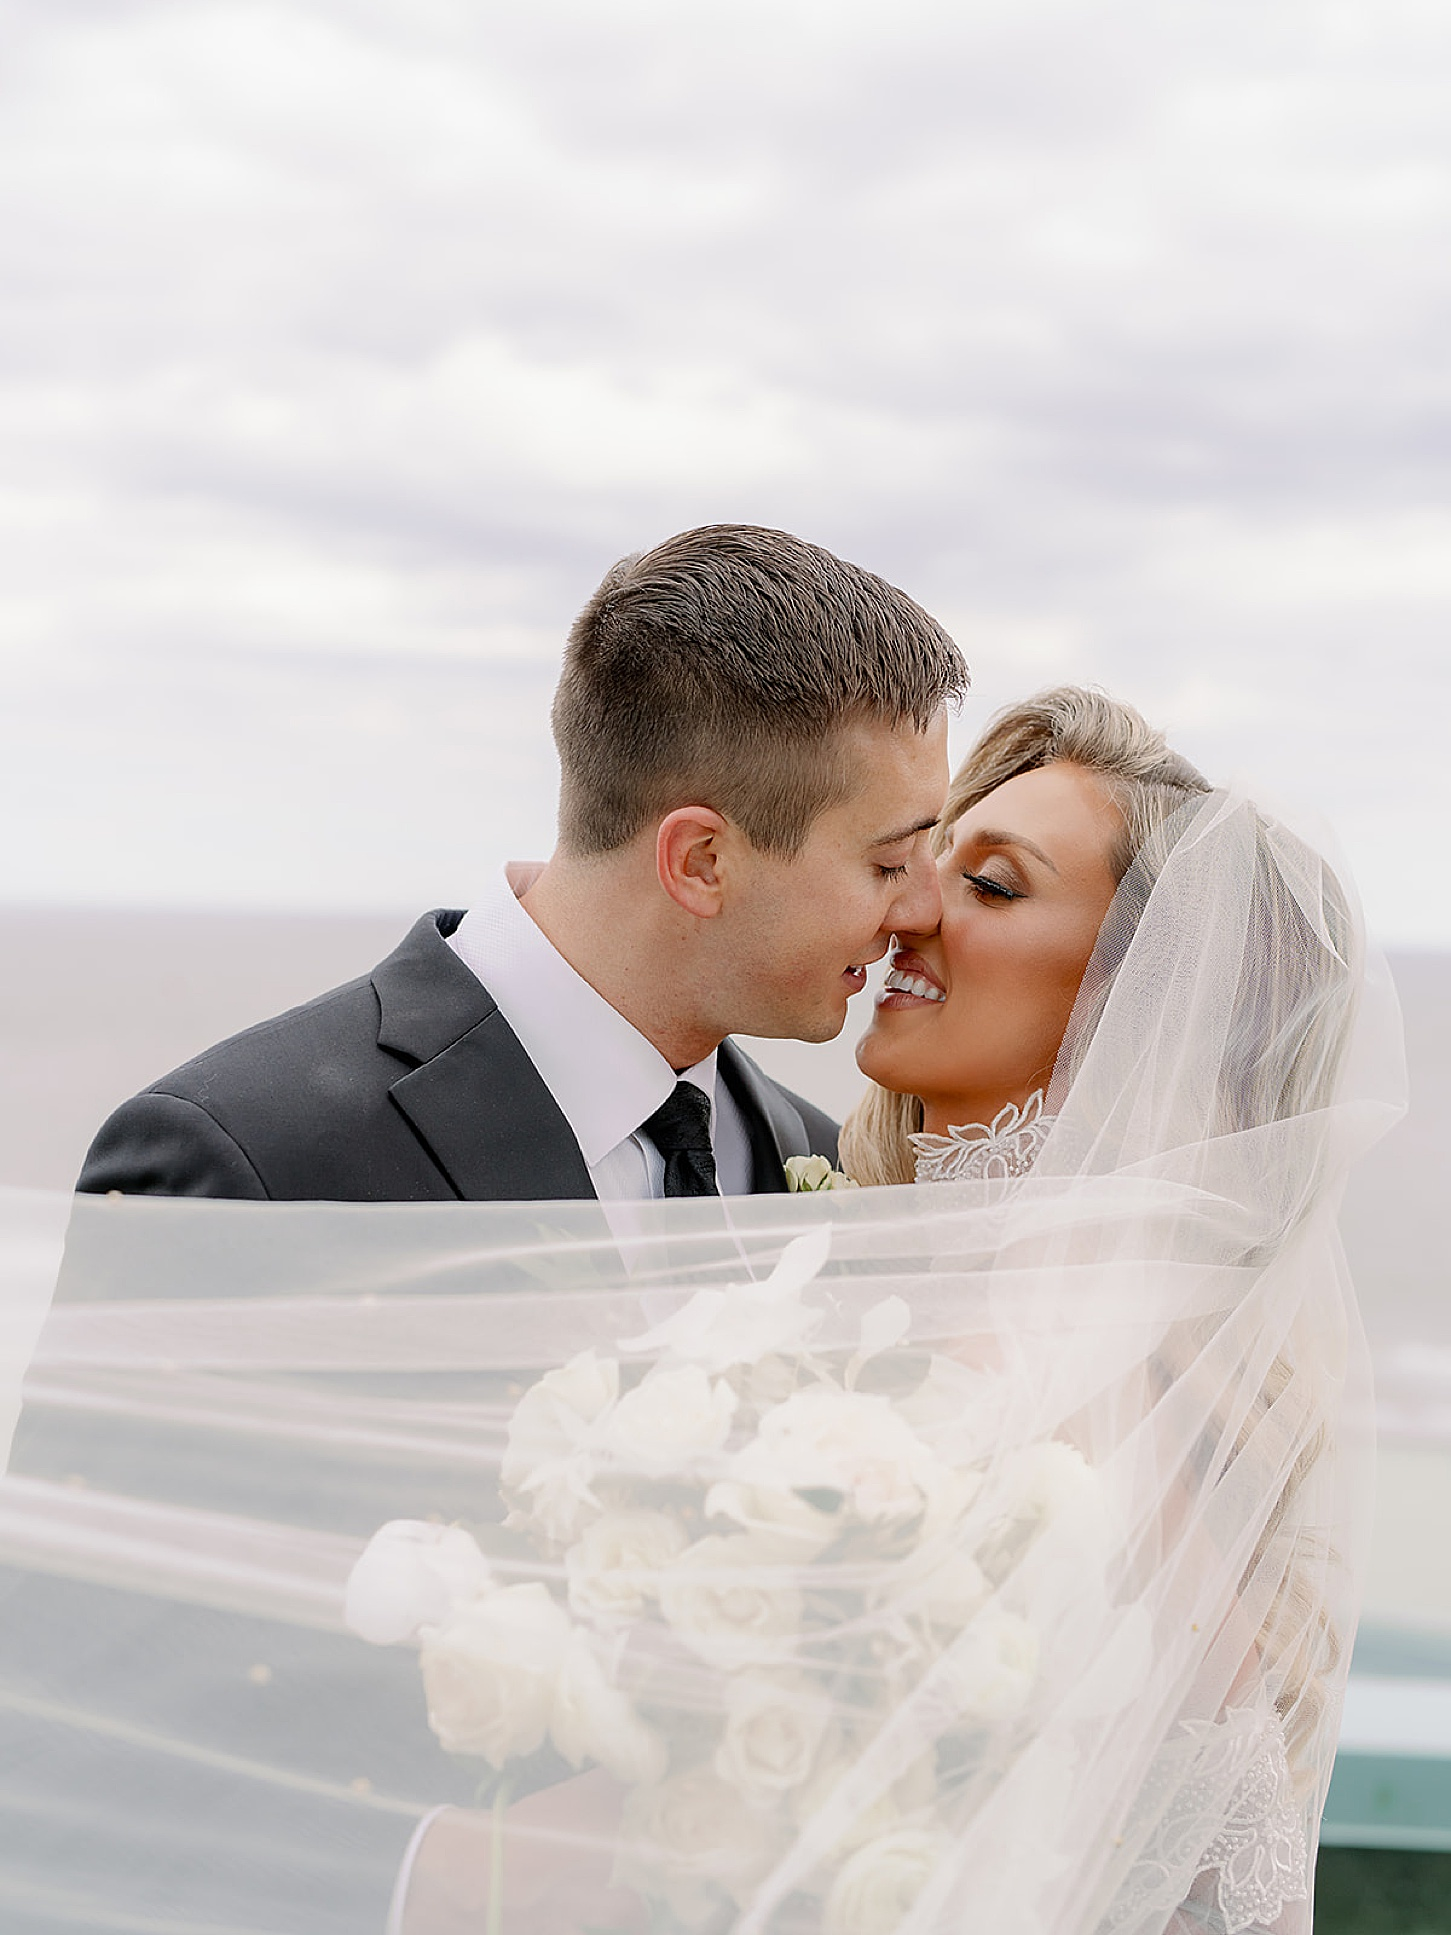 Atlantic City Wedding Photography Studio by Magdalena Studios Lexy Cha 0054